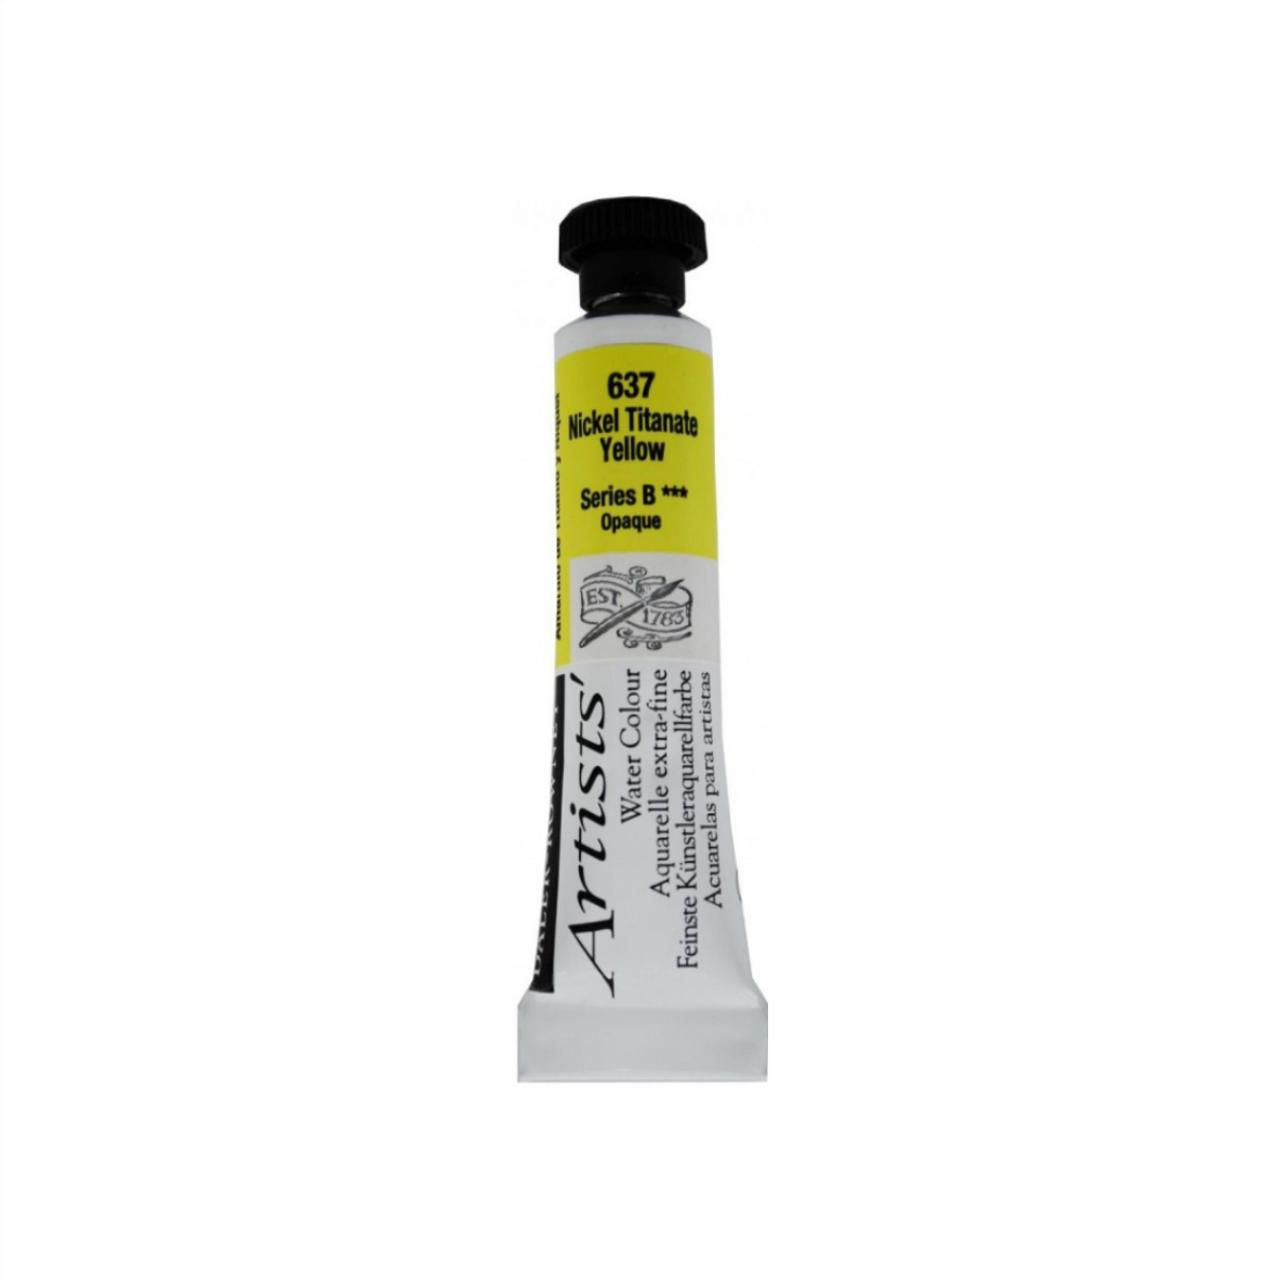 Daler-Rowney Artists' Watercolour Tube 15ml - Nickel Titanite Yellow #637